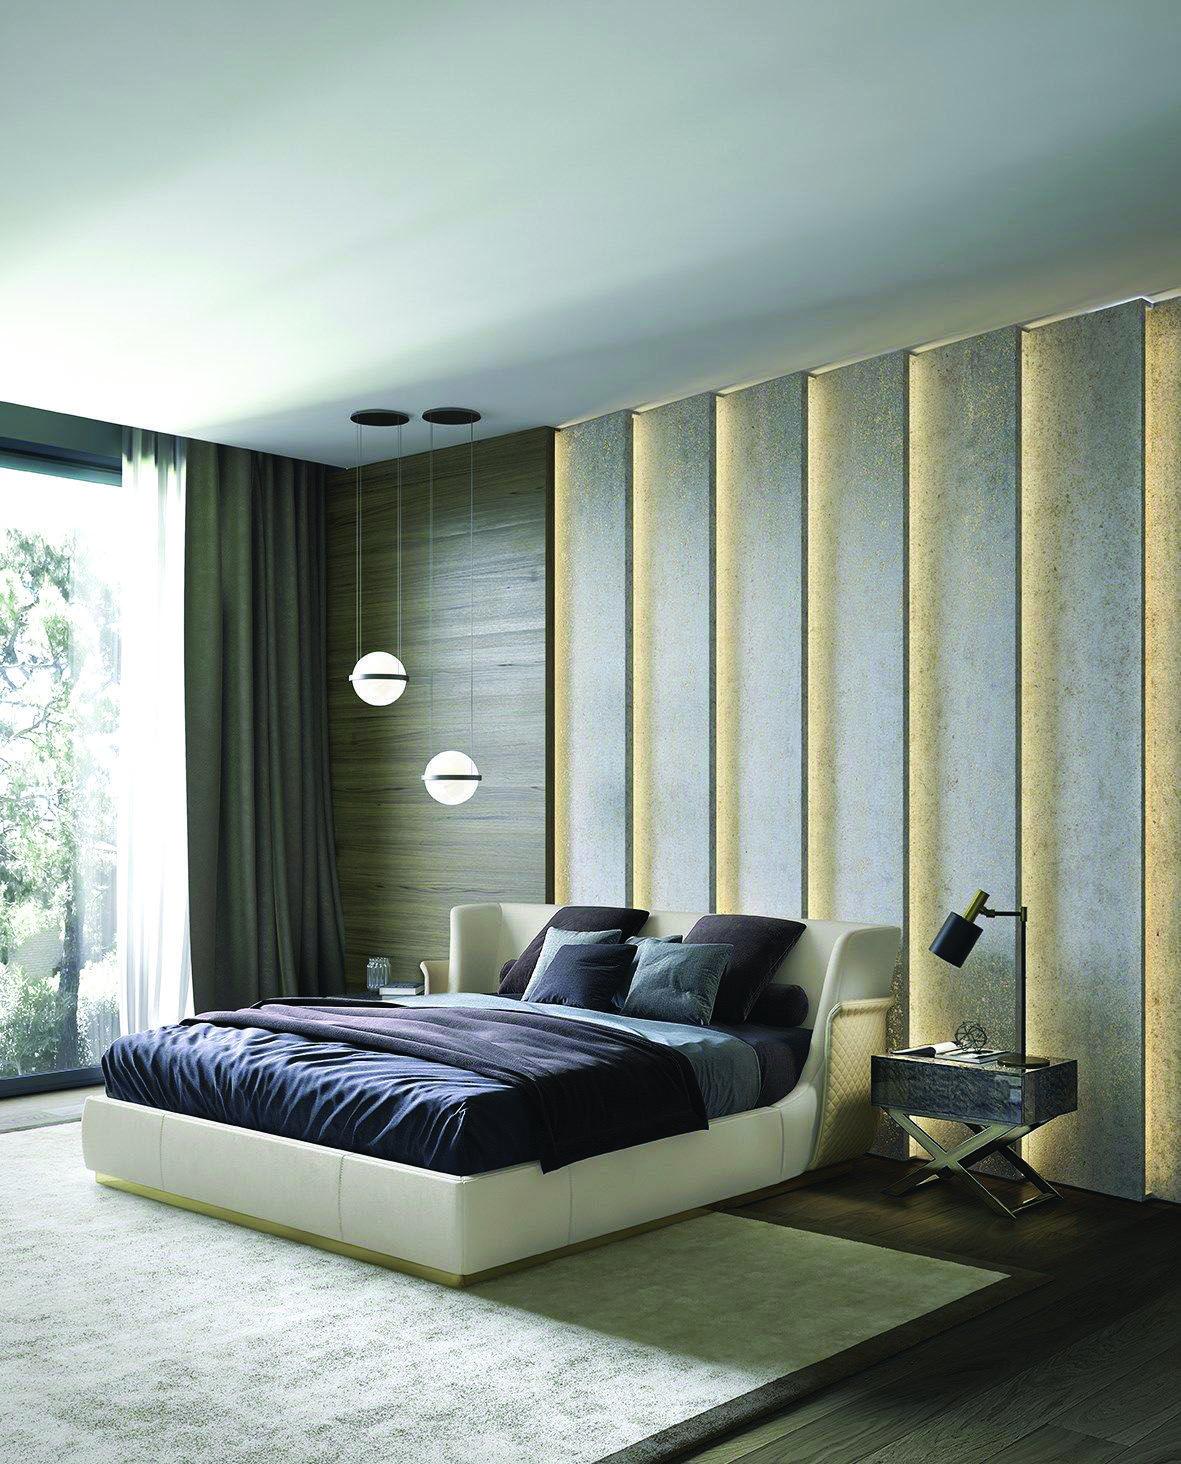 Modern Bedroom Ideas Homes Tre Simple Bedroom Design Bedroom Furniture Design Bedroom Bed Design